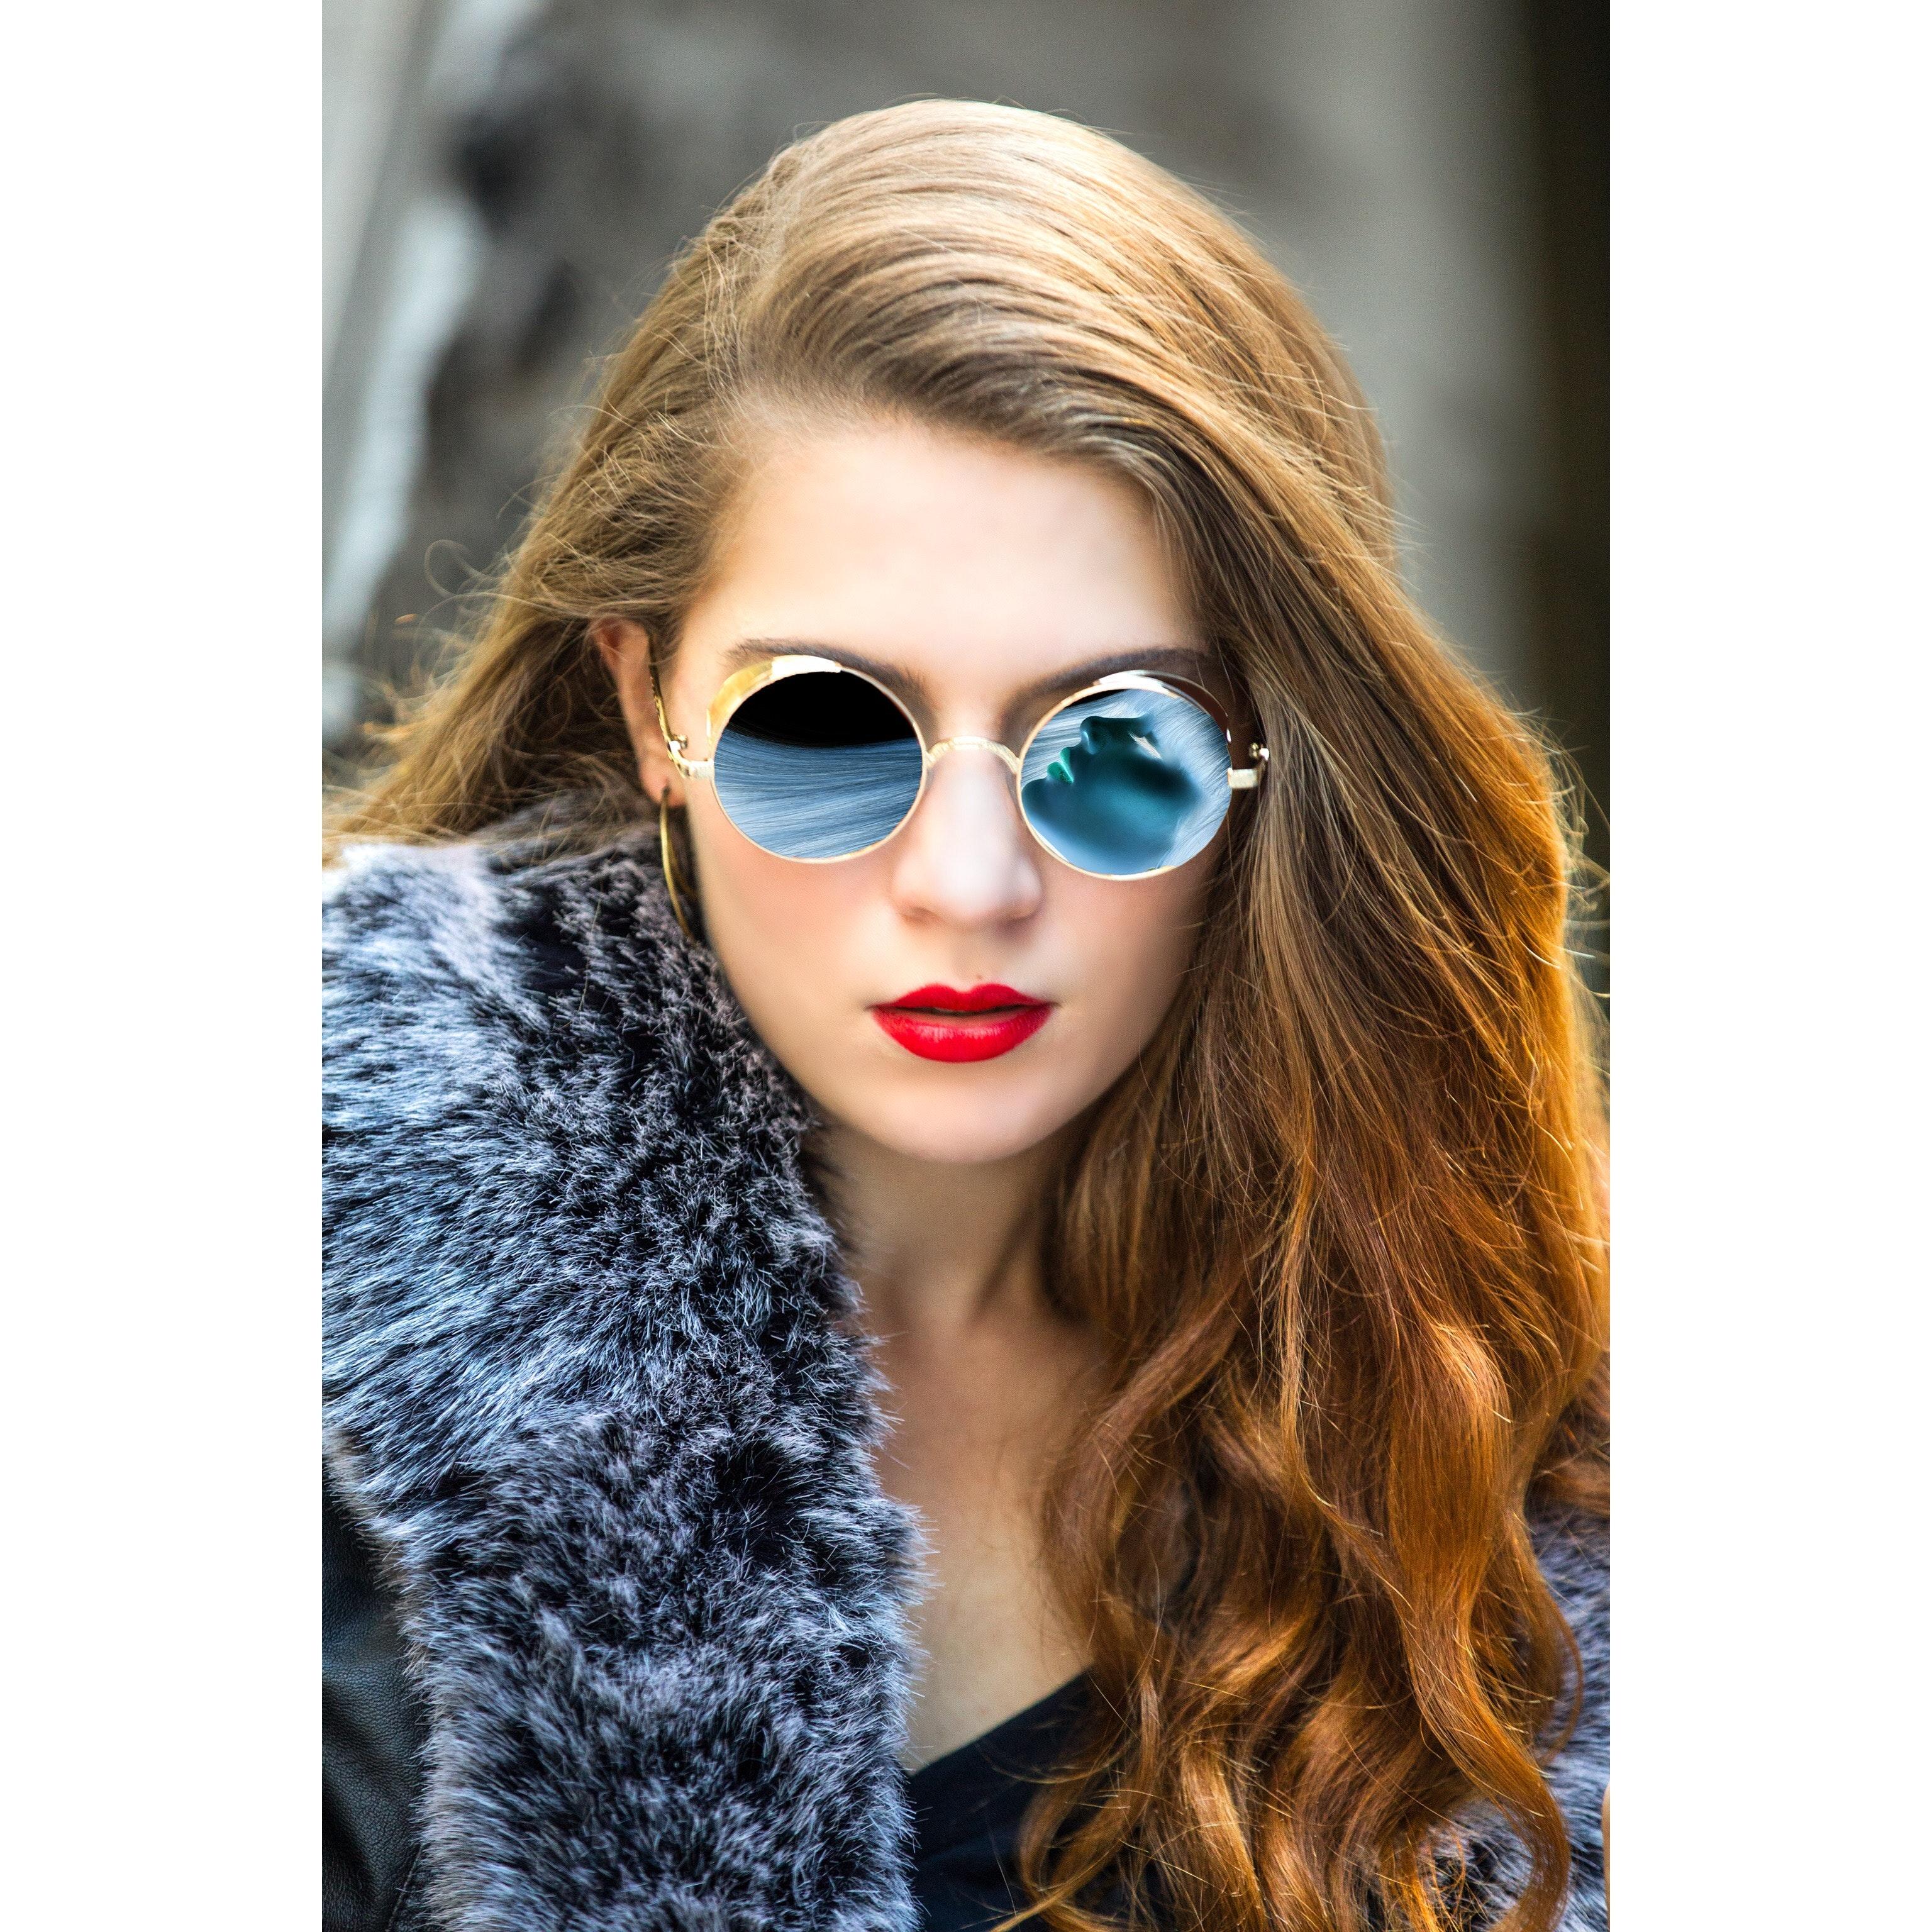 Woman taking selfie wearing round blue sunglasses photo